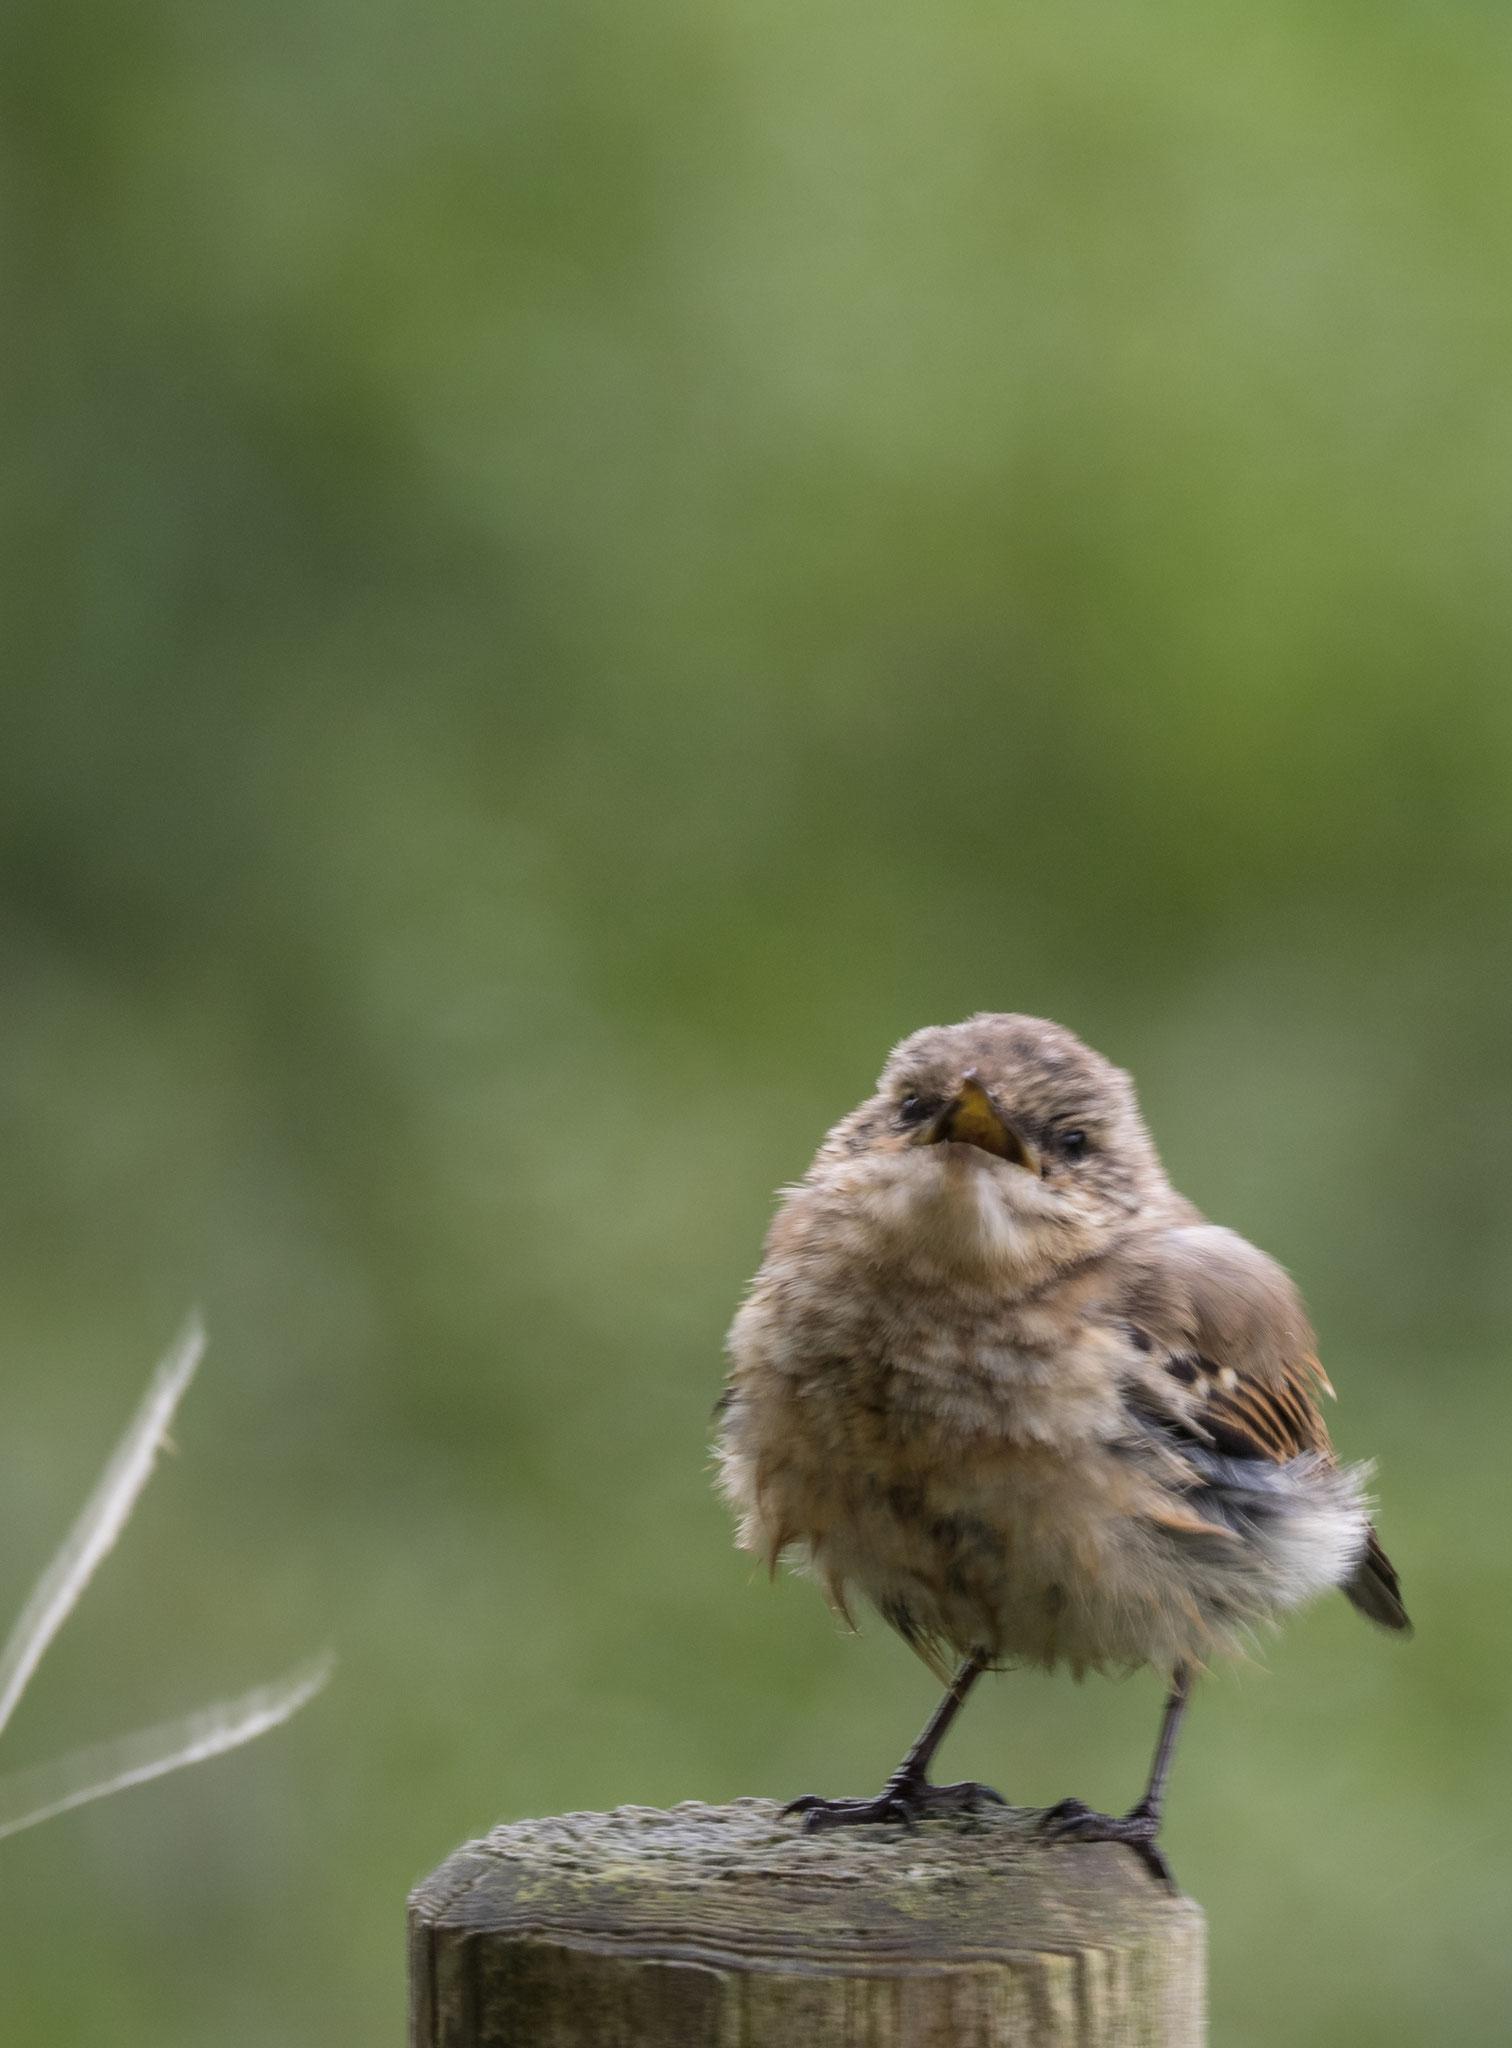 Bild: Vogel